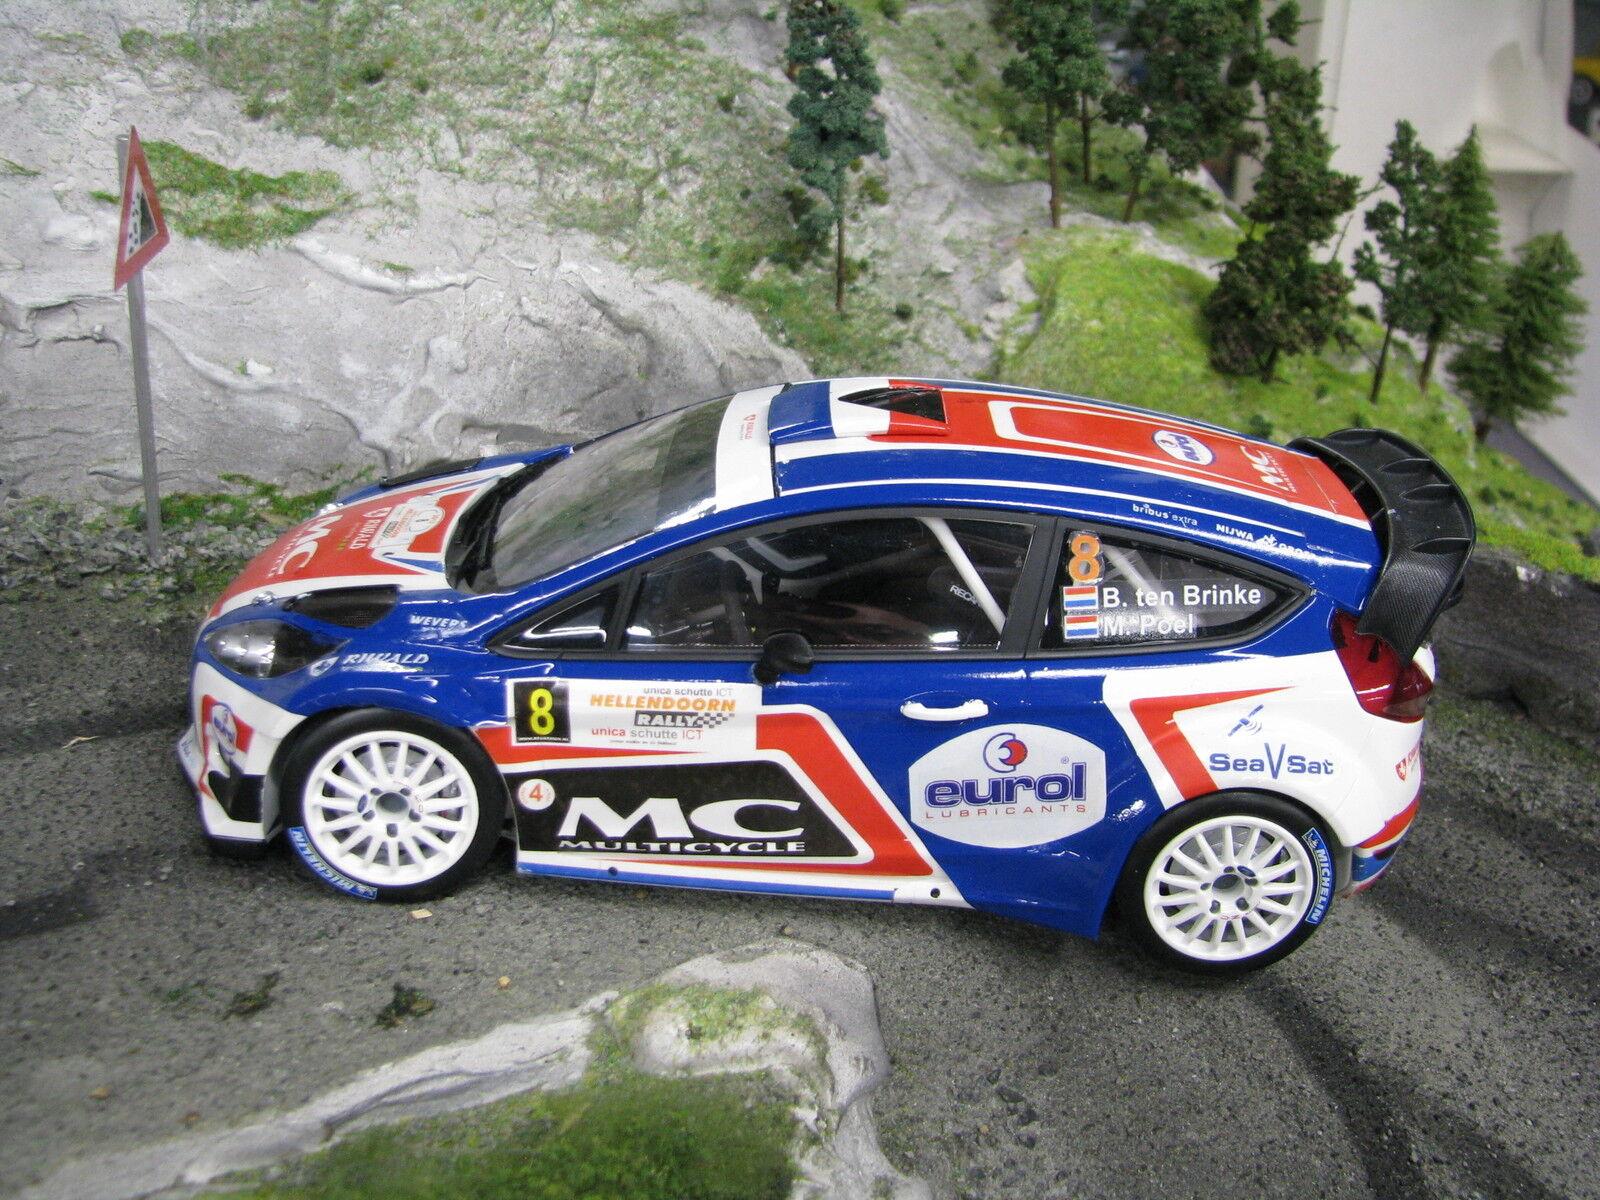 Minichamps Ford Fiesta WRC 2013 1:18  8 Ten Brinke / Poel Hellendoorn Rally